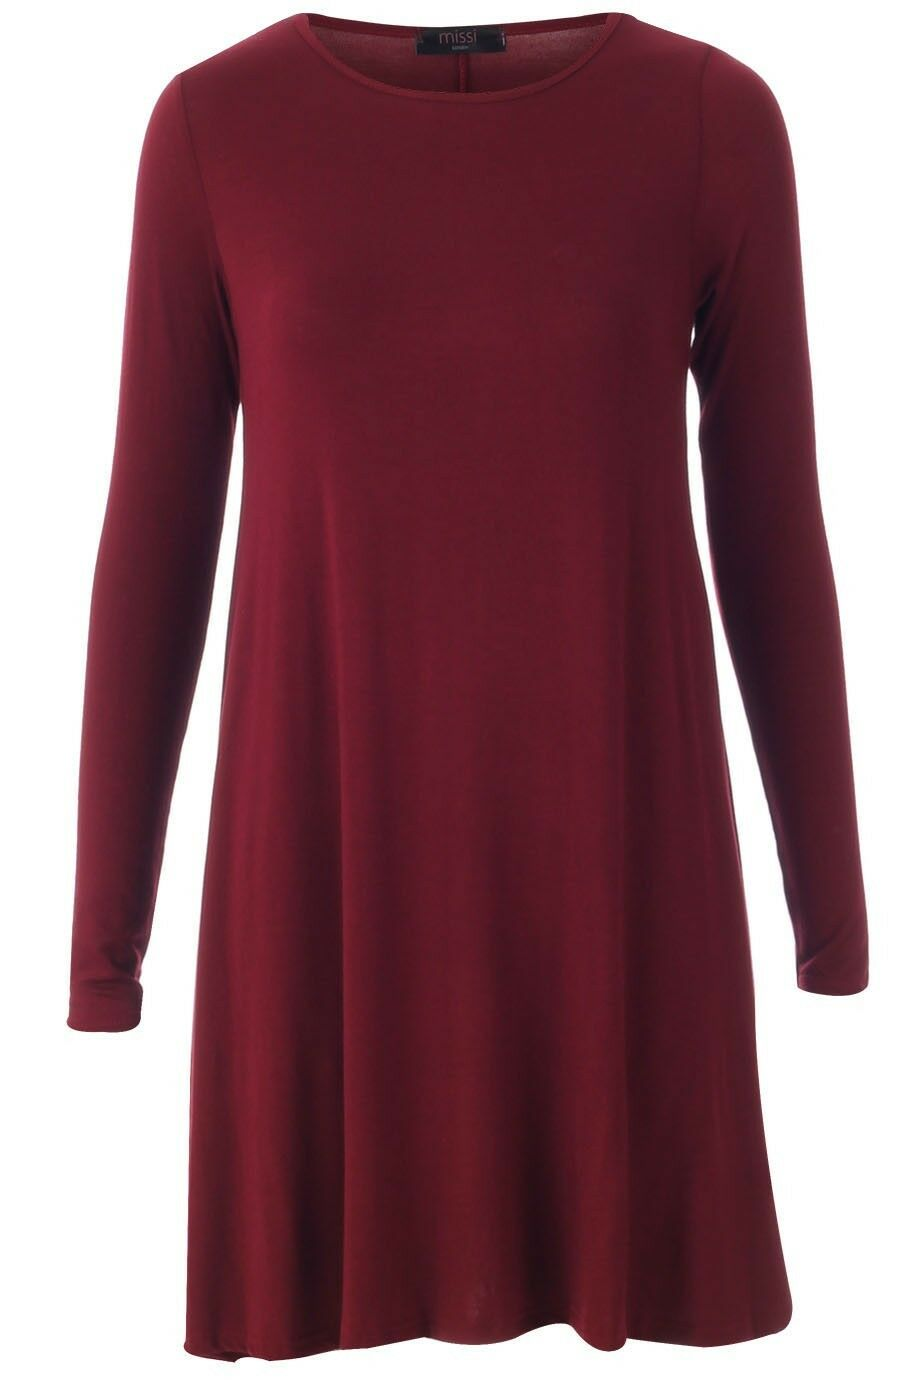 Mesdames à femmes celebrity inspiré tartan skater évasée robe swing à Mesdames manches longues top ca239b